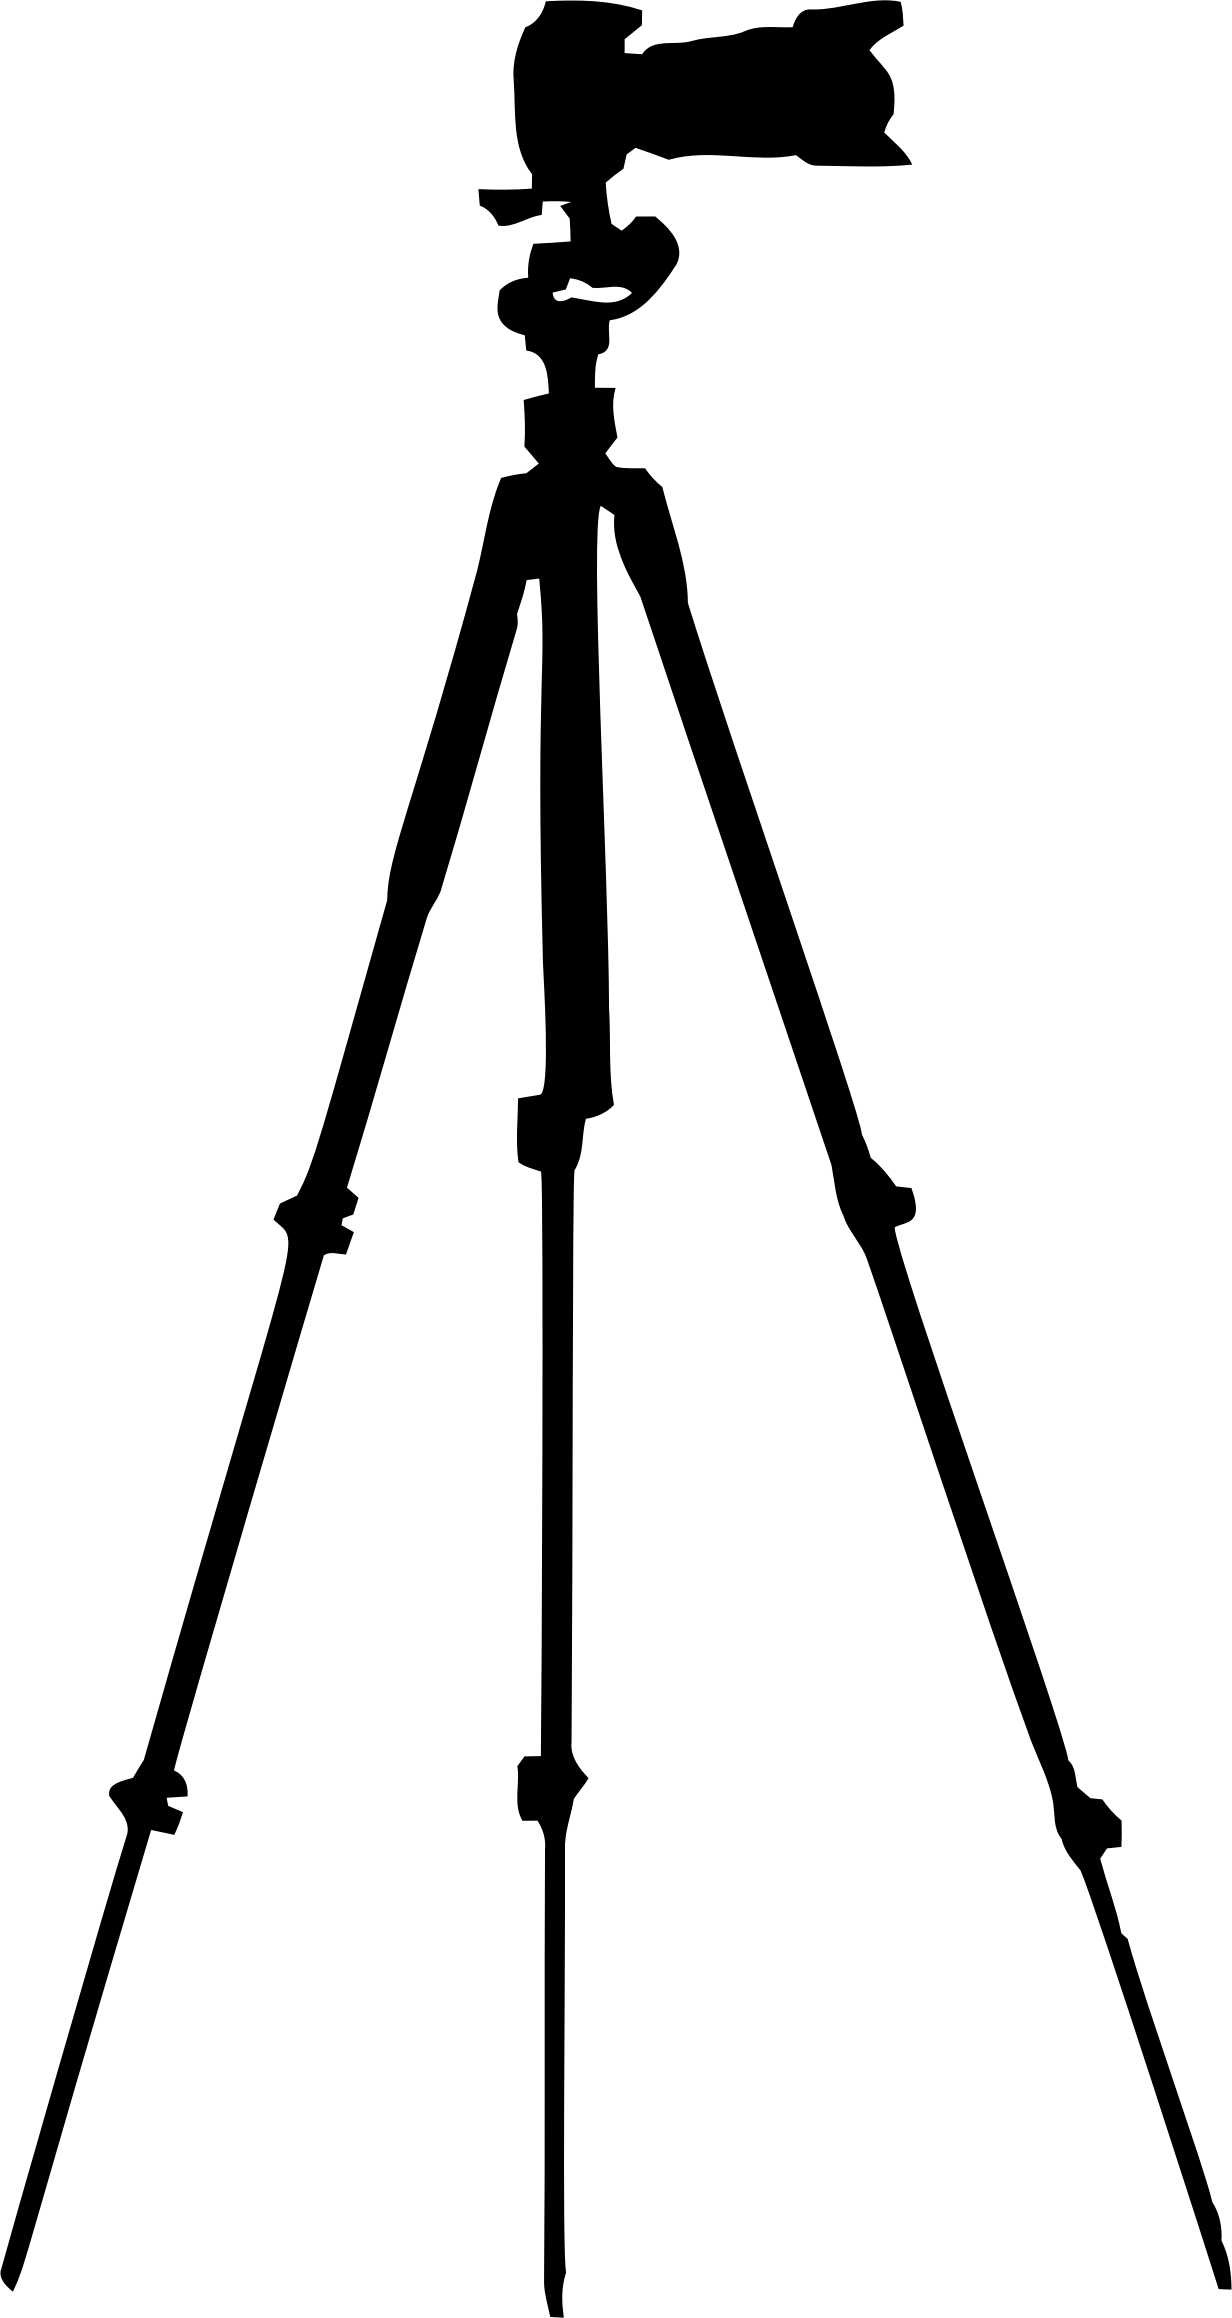 Tripod PNG File SVG Clip arts